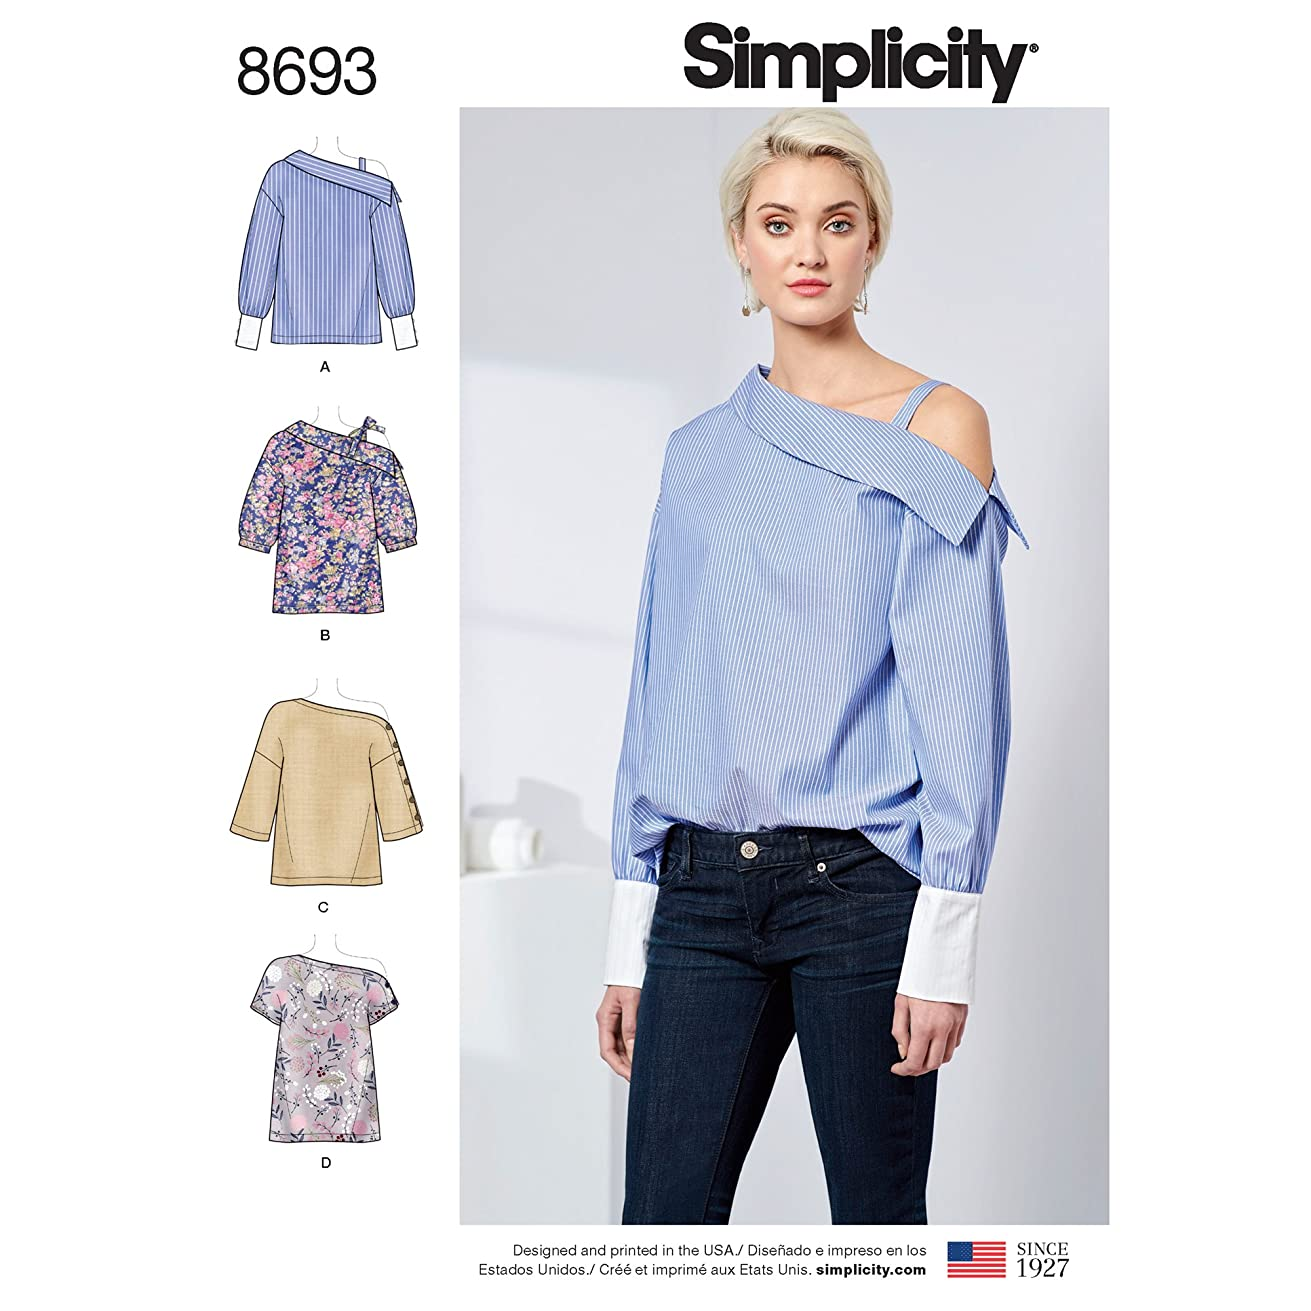 Simplicity Creative Patterns US8693H5 Pattern 8693 Misses' One Shoulder Tops